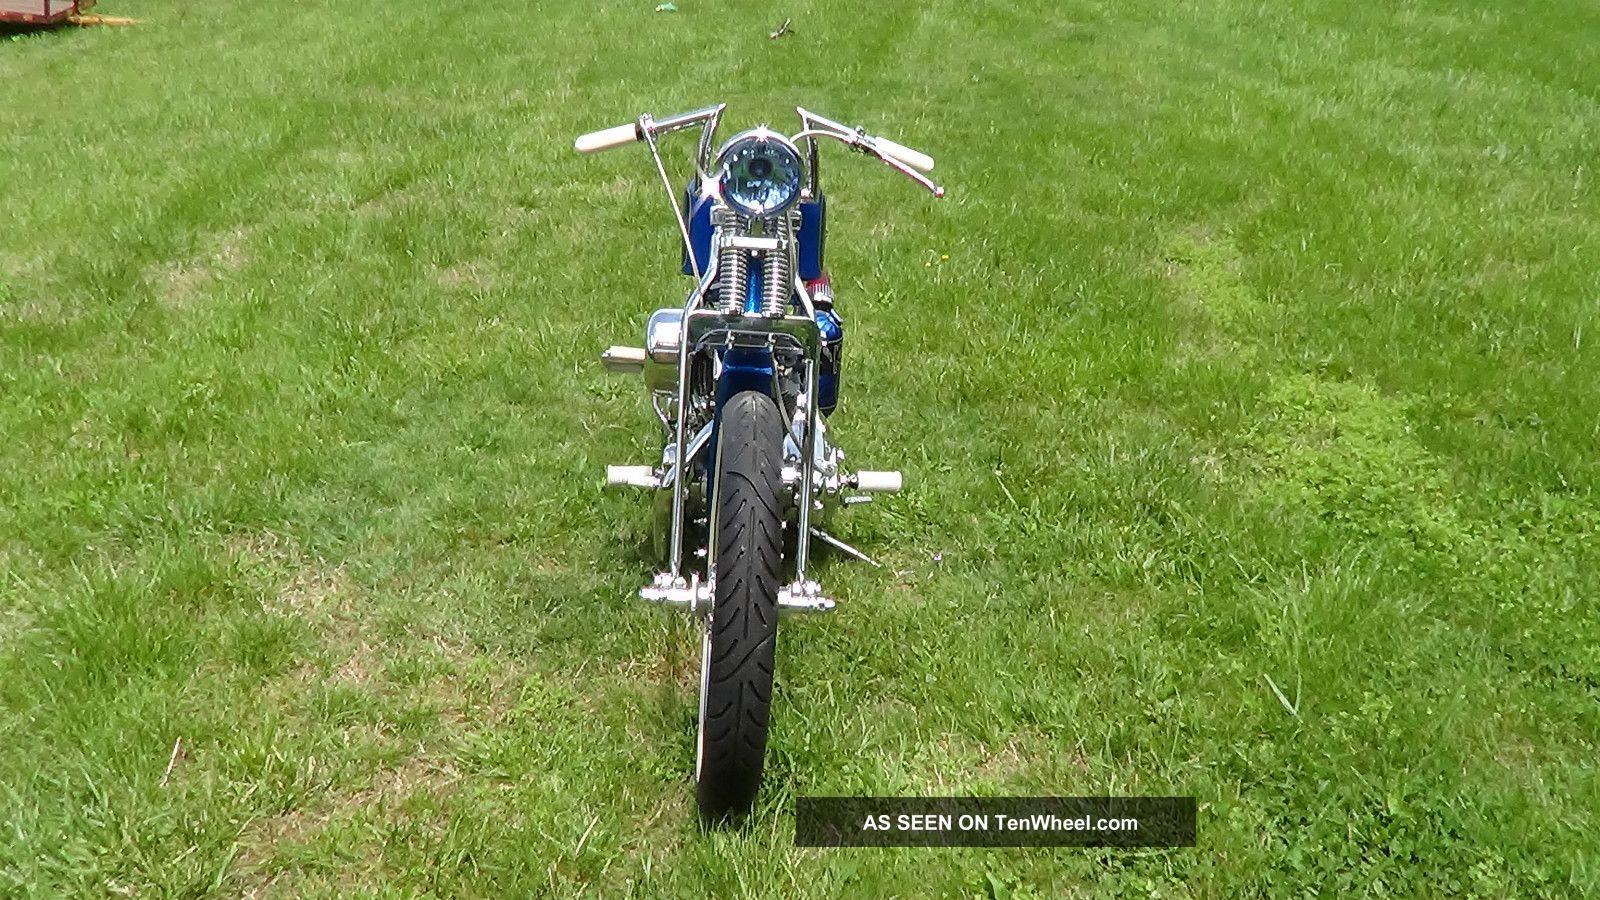 1973 Ironhead Sportster Wiring Diagram Trusted Diagrams 77 Harley Xl Chopper Oil Pump Davidson